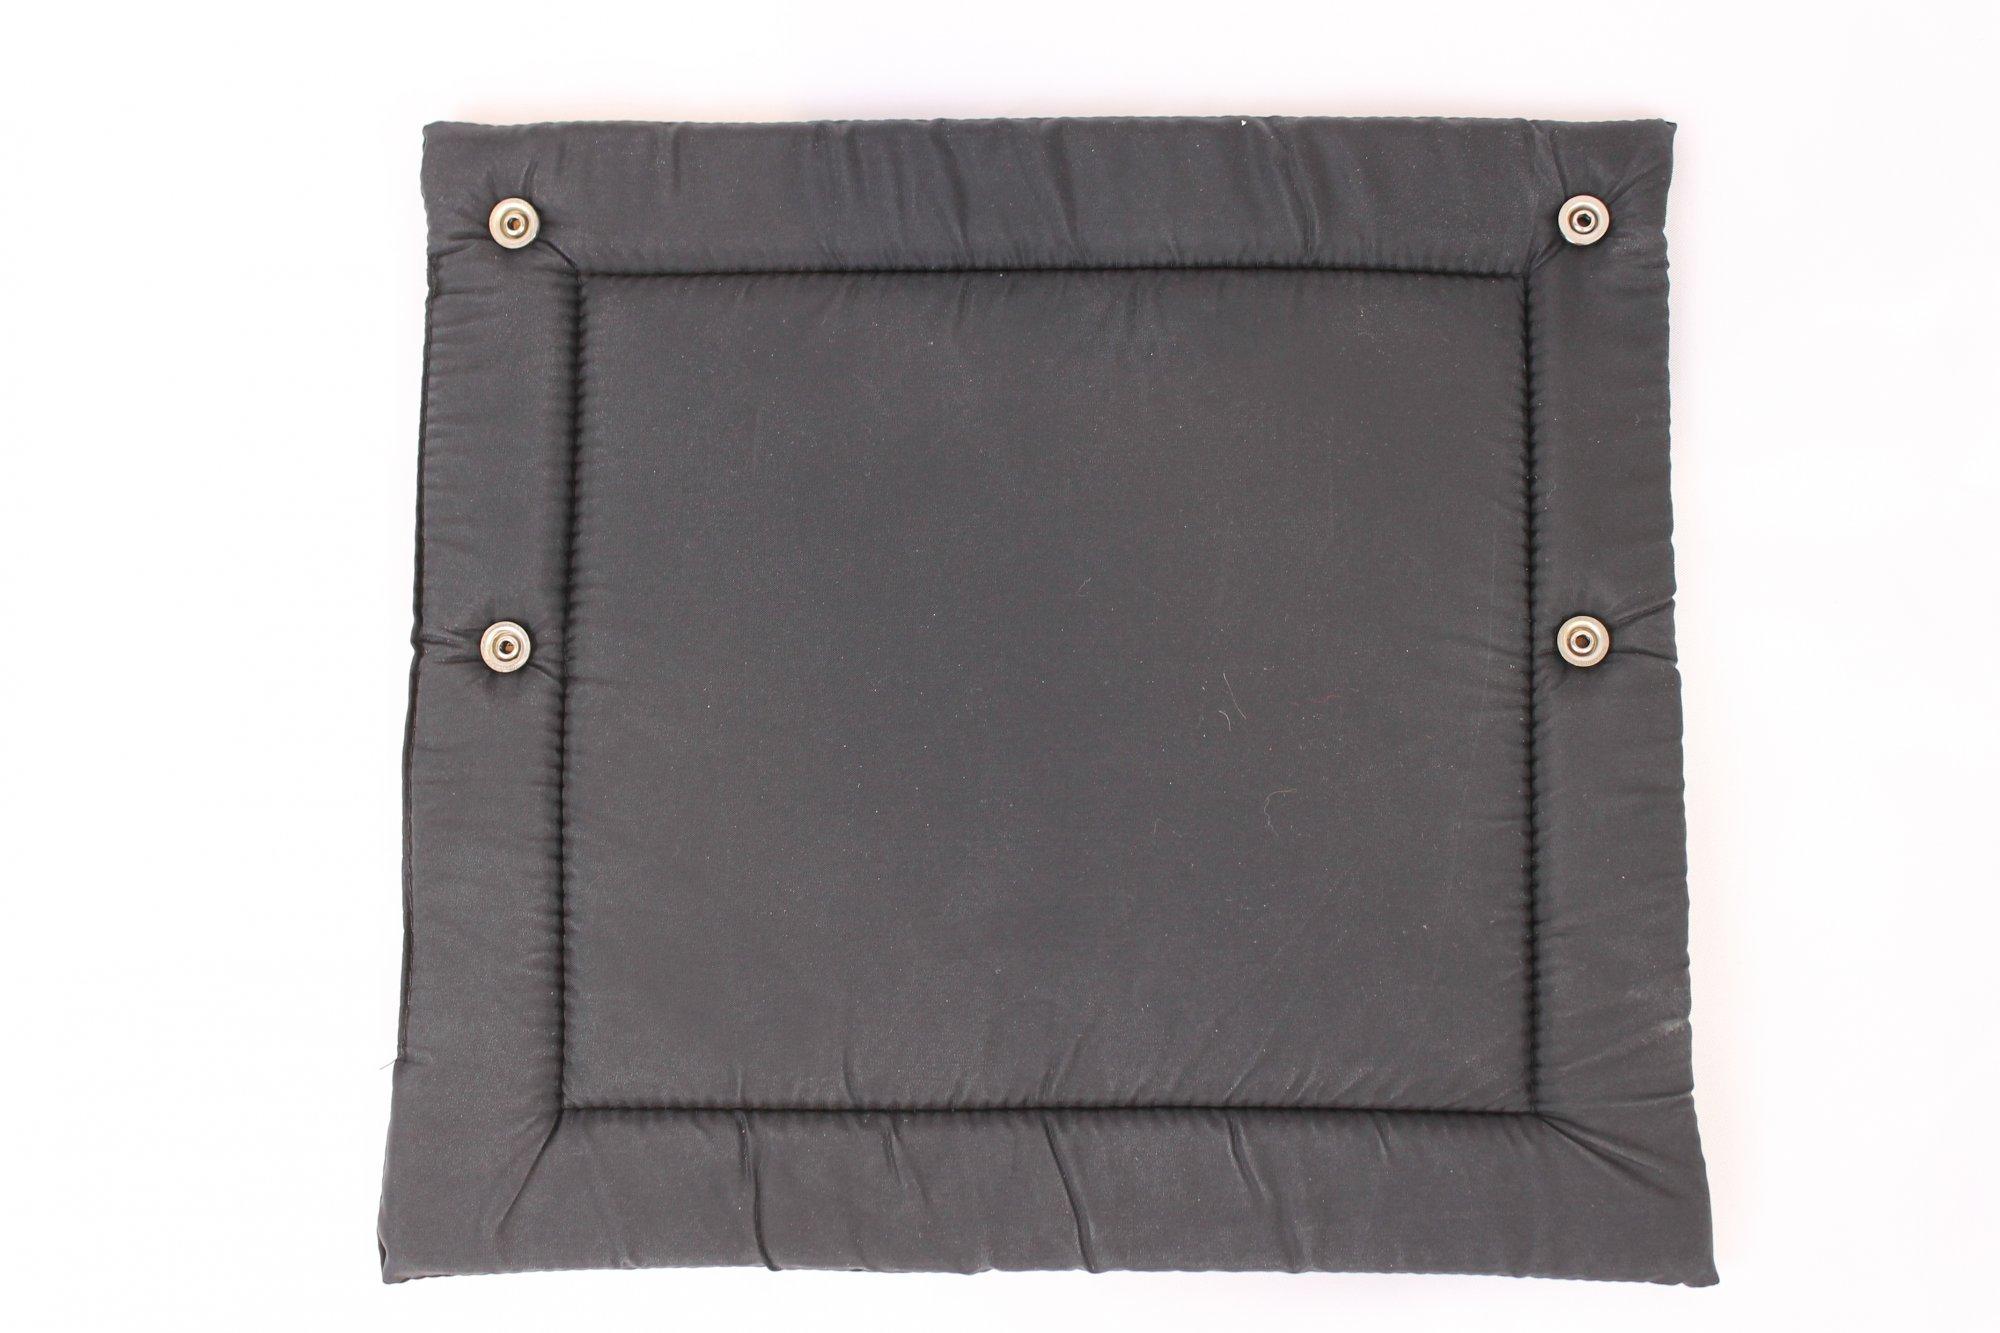 NEW Black Accordion Back Pad Width (28cm / 11in) Length (25.5cm / 10in)